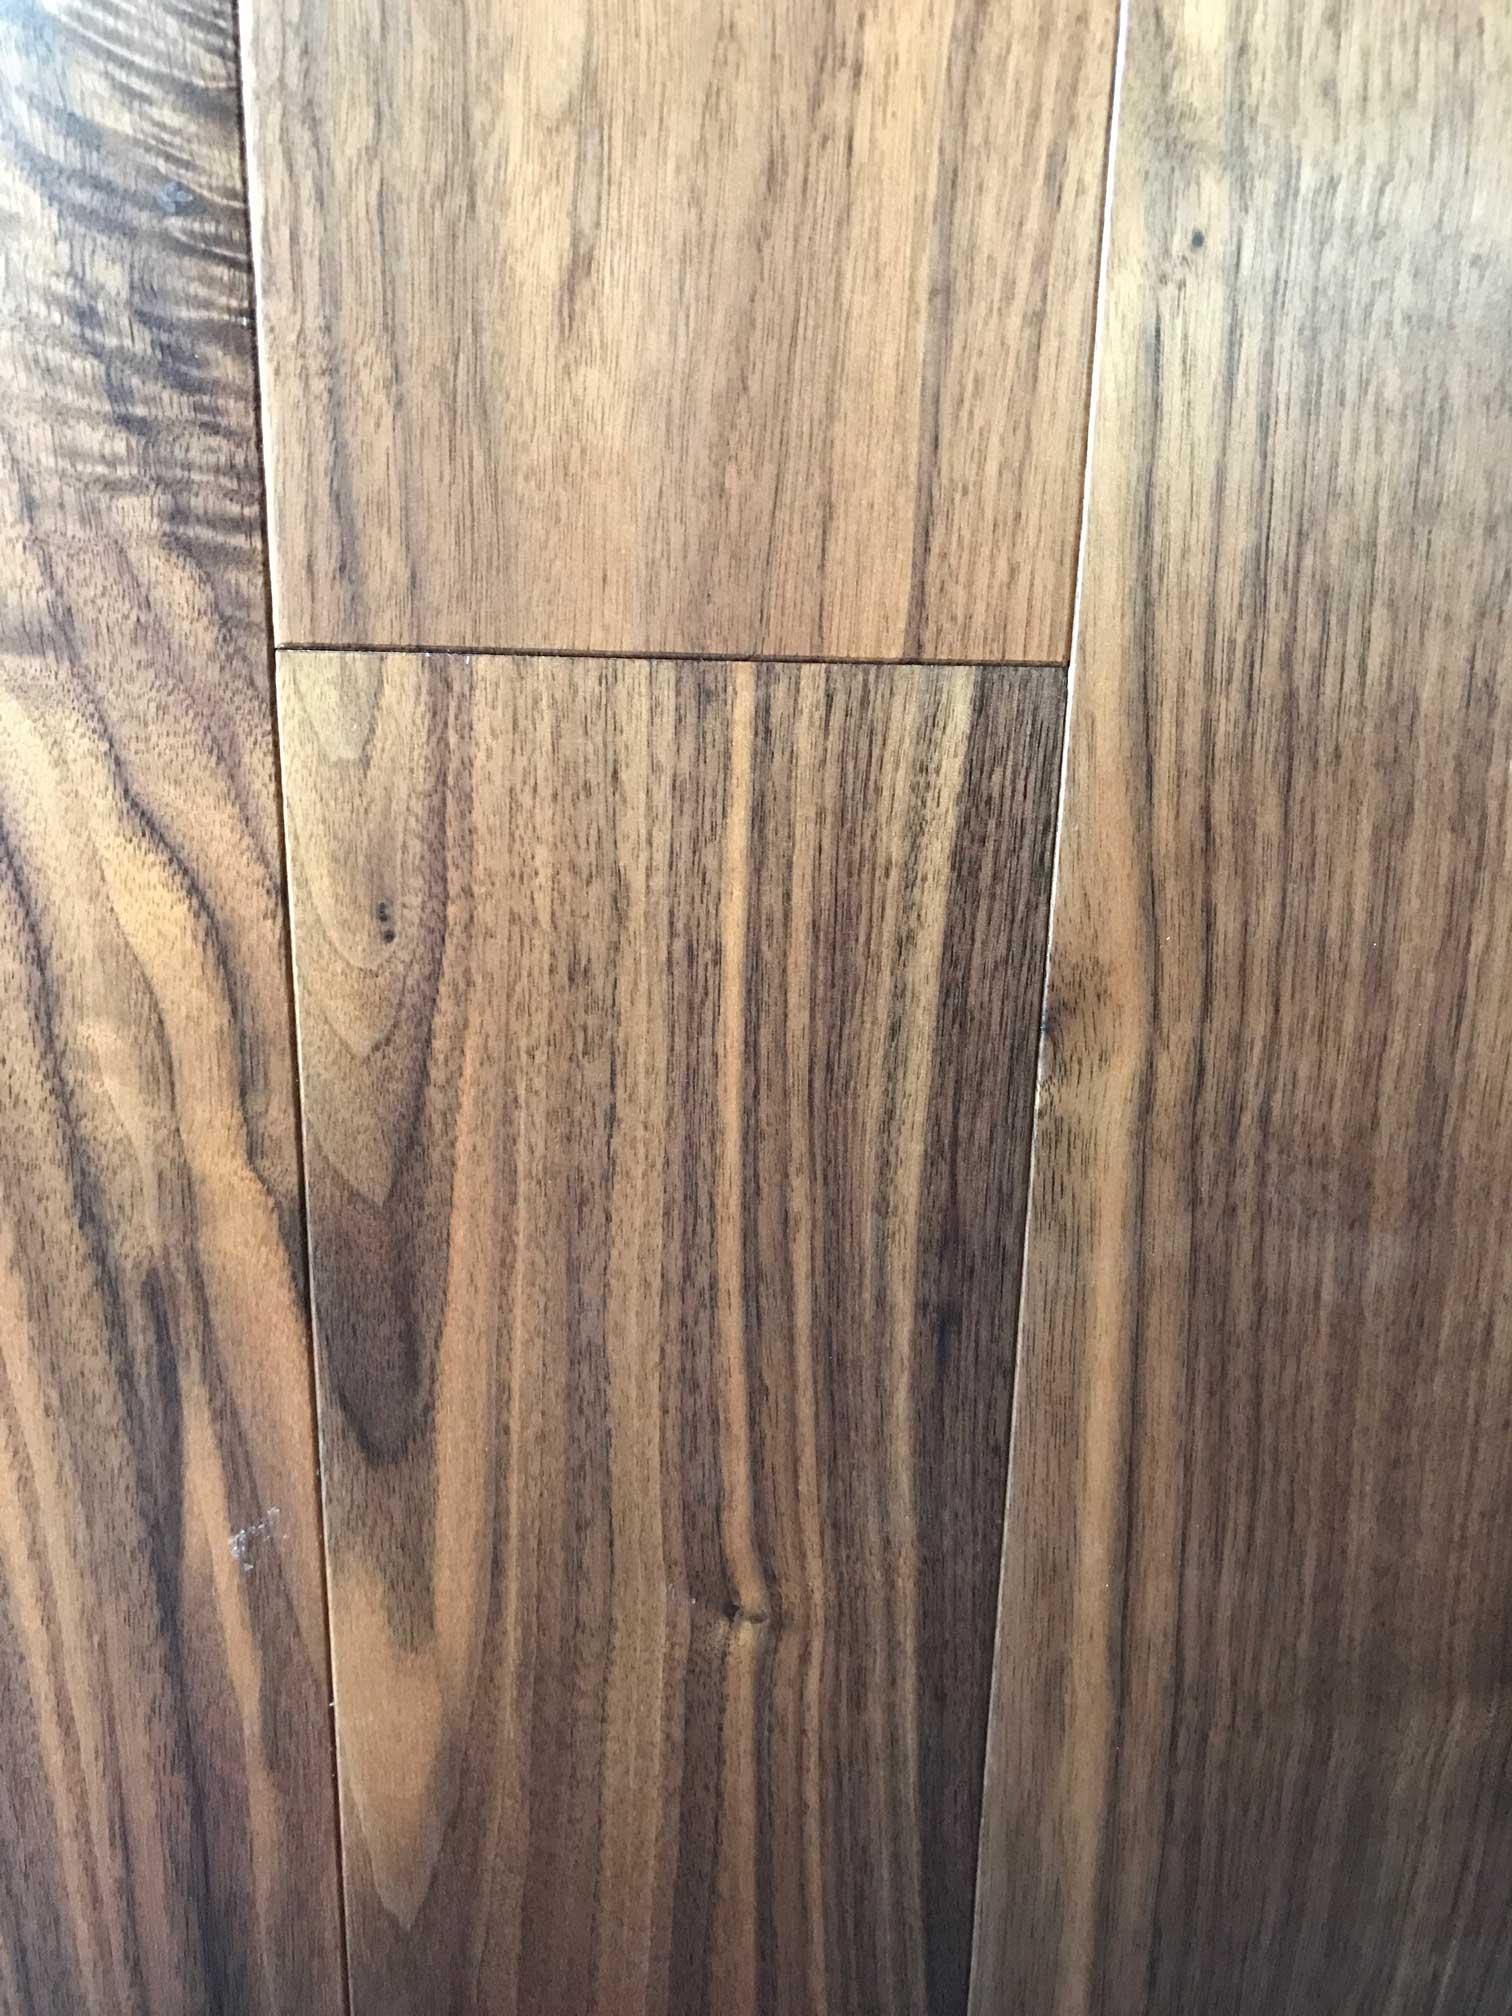 Dansk Walnut Restoration Engineered Hardwood Flooring Divine Hardwood & Stone Portland